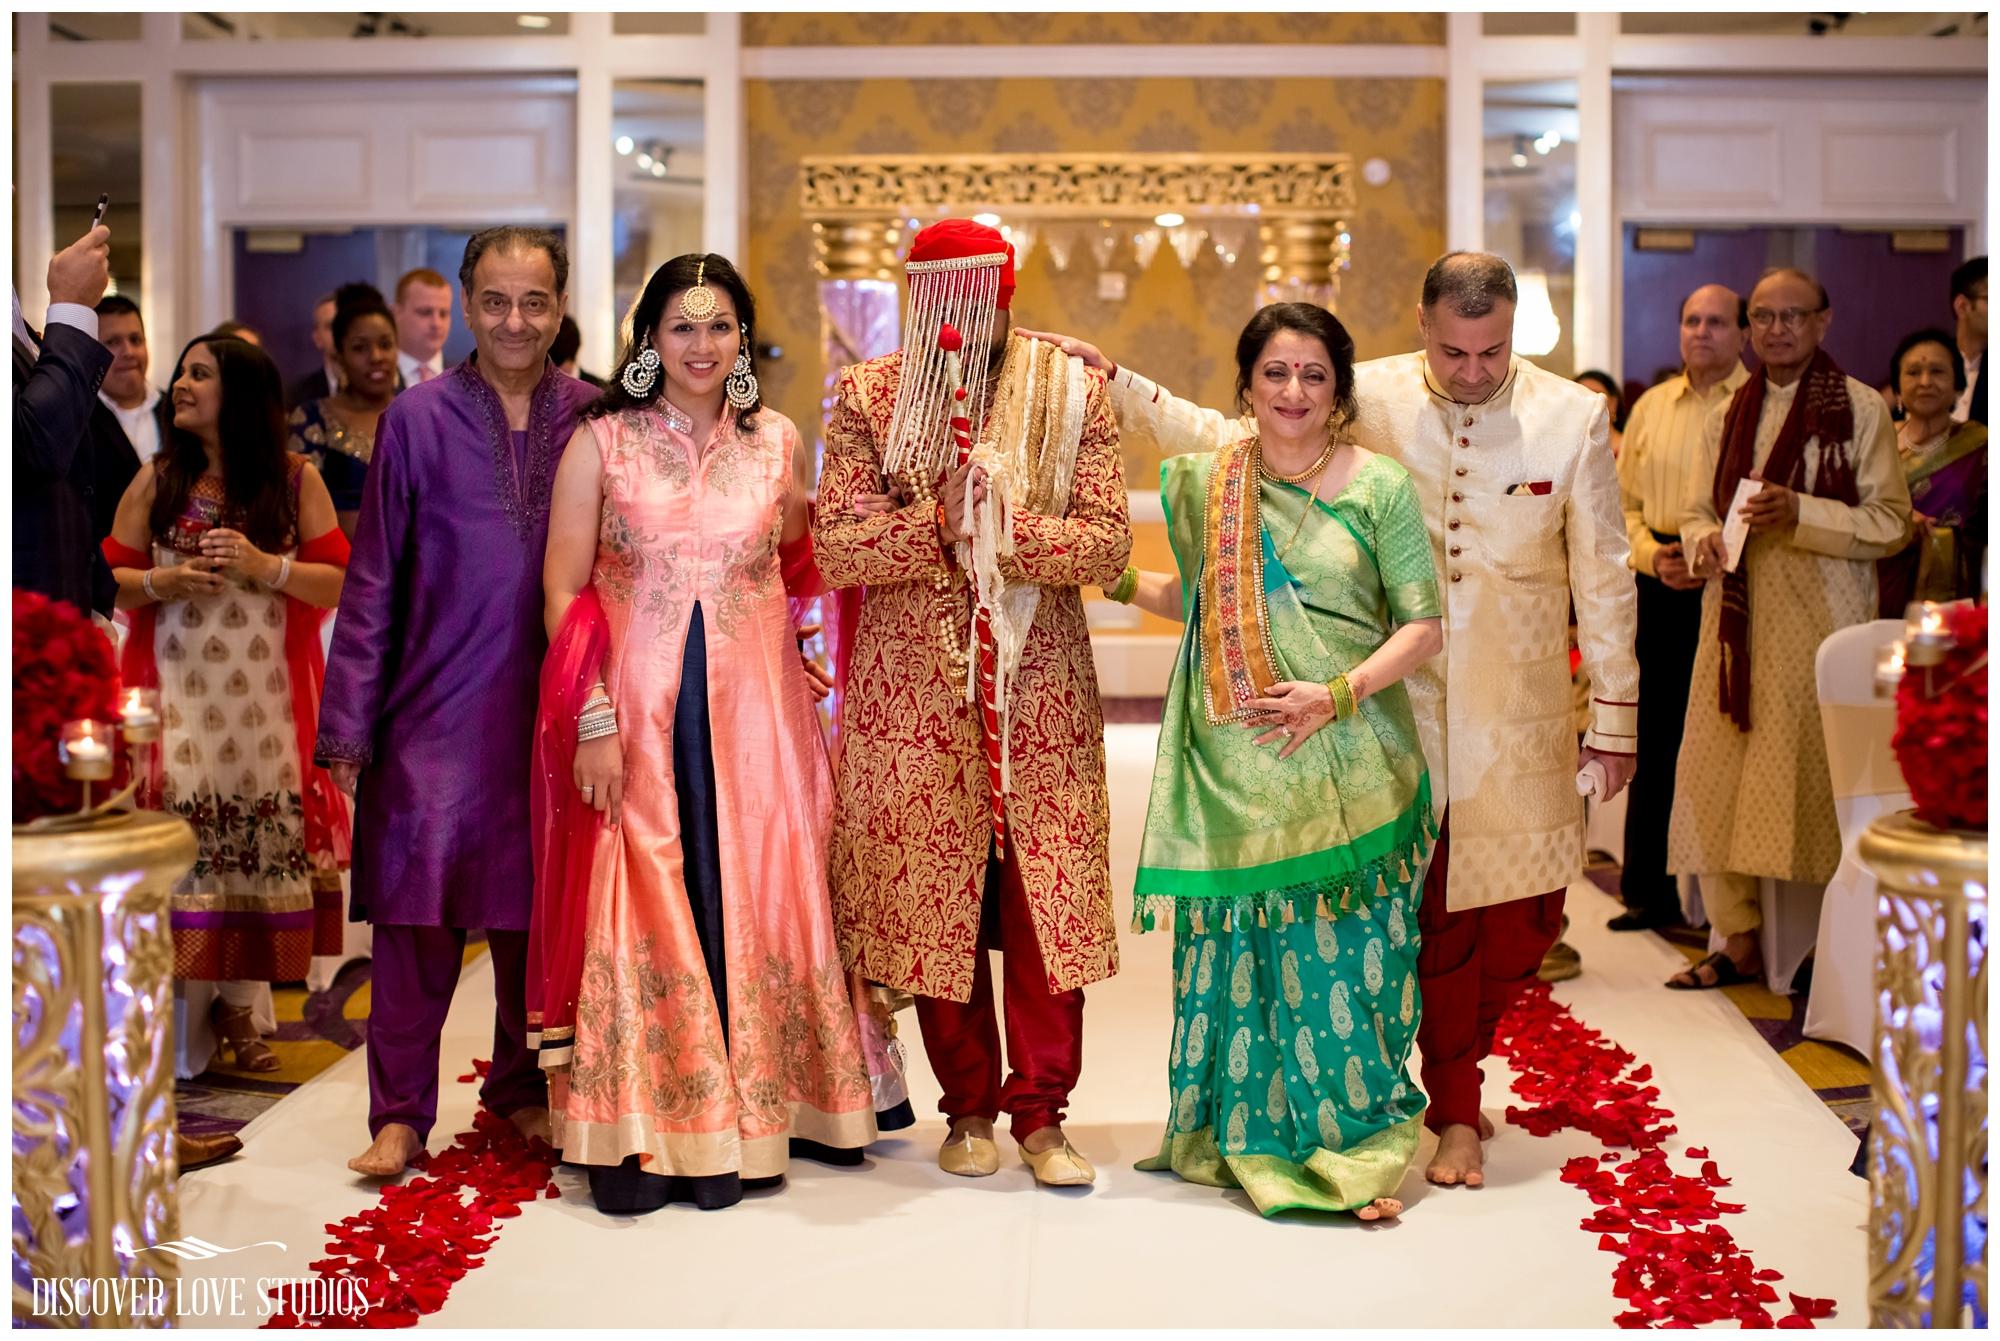 AneeshaVikasIndianWeddingHiltonCharlotteNCDiscoverLoveStudios_0025.jpg